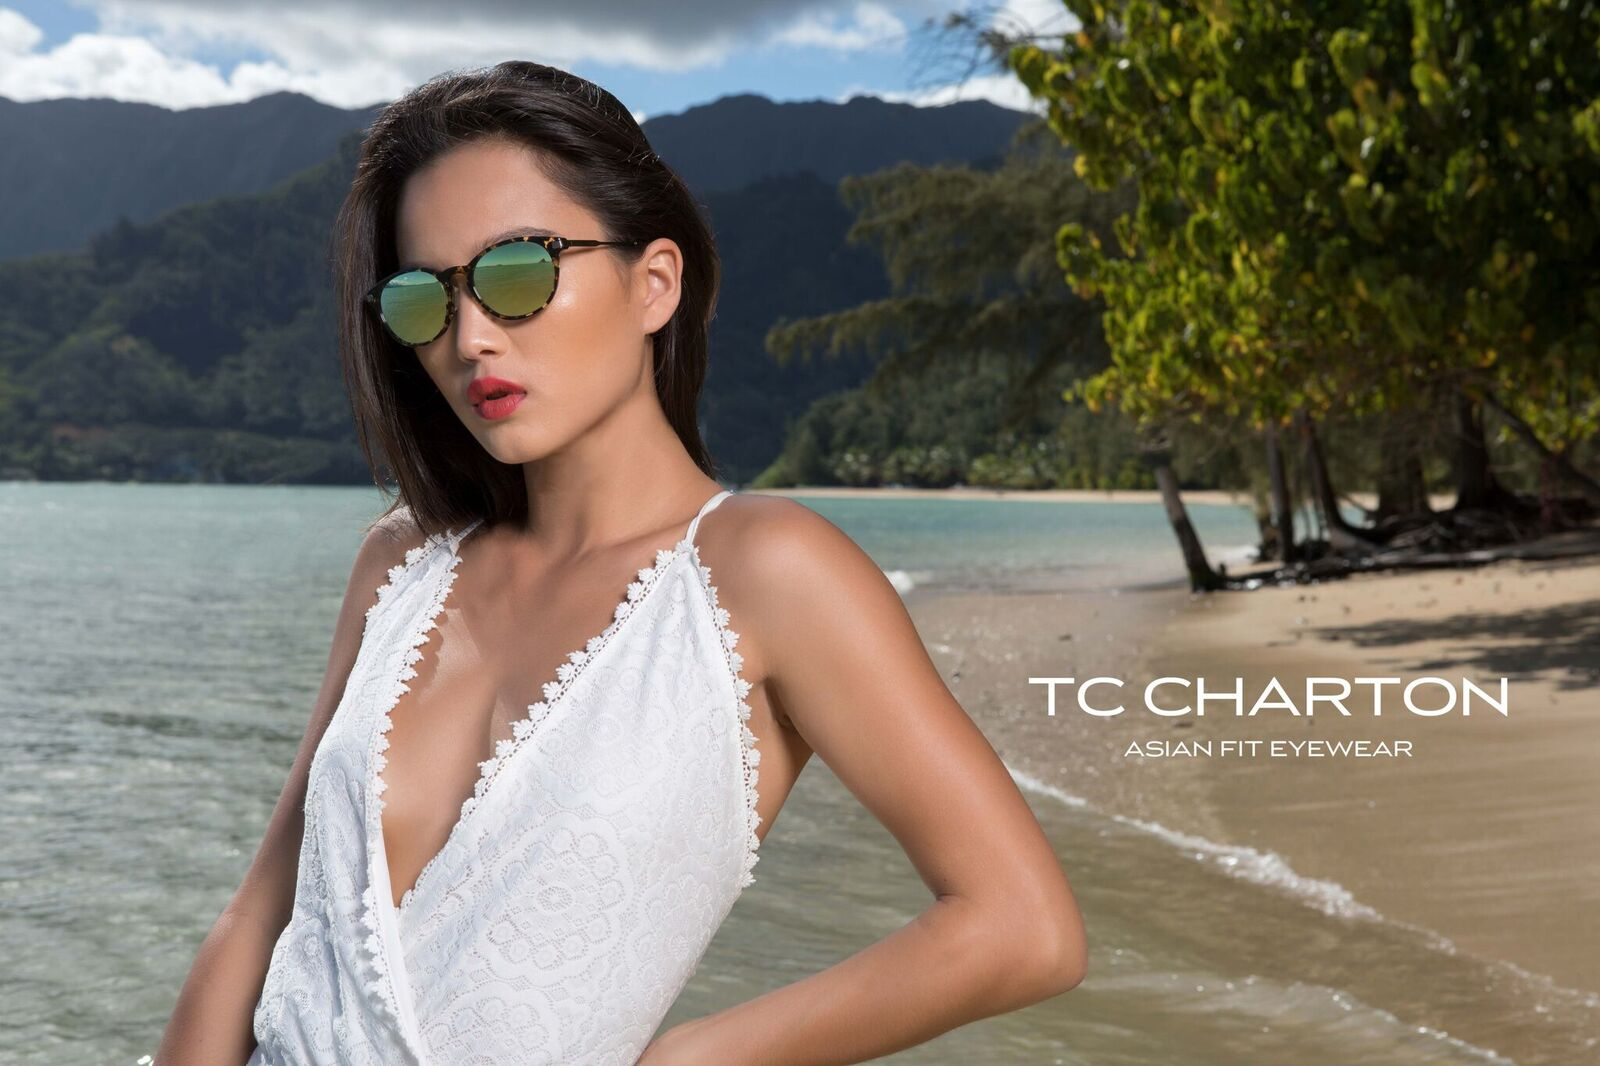 TC charton Eyewearr